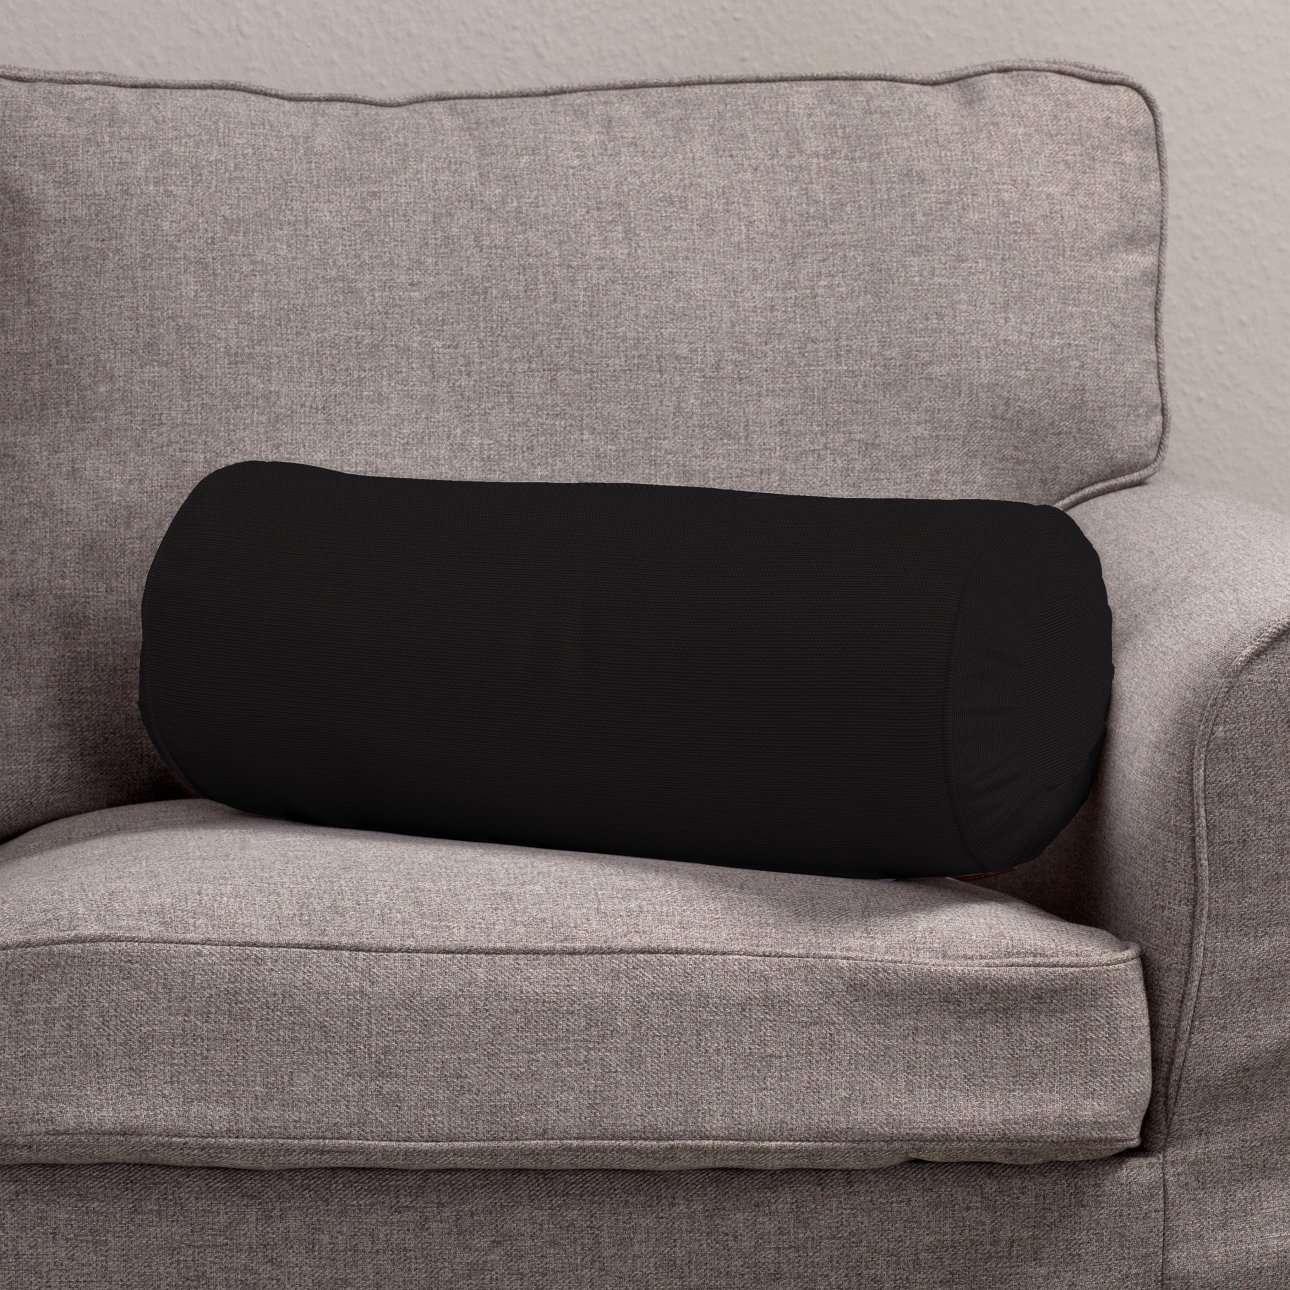 Nakkepude med folder Ø 20 x 50 cm fra kollektionen Cotton Panama, Stof: 702-09